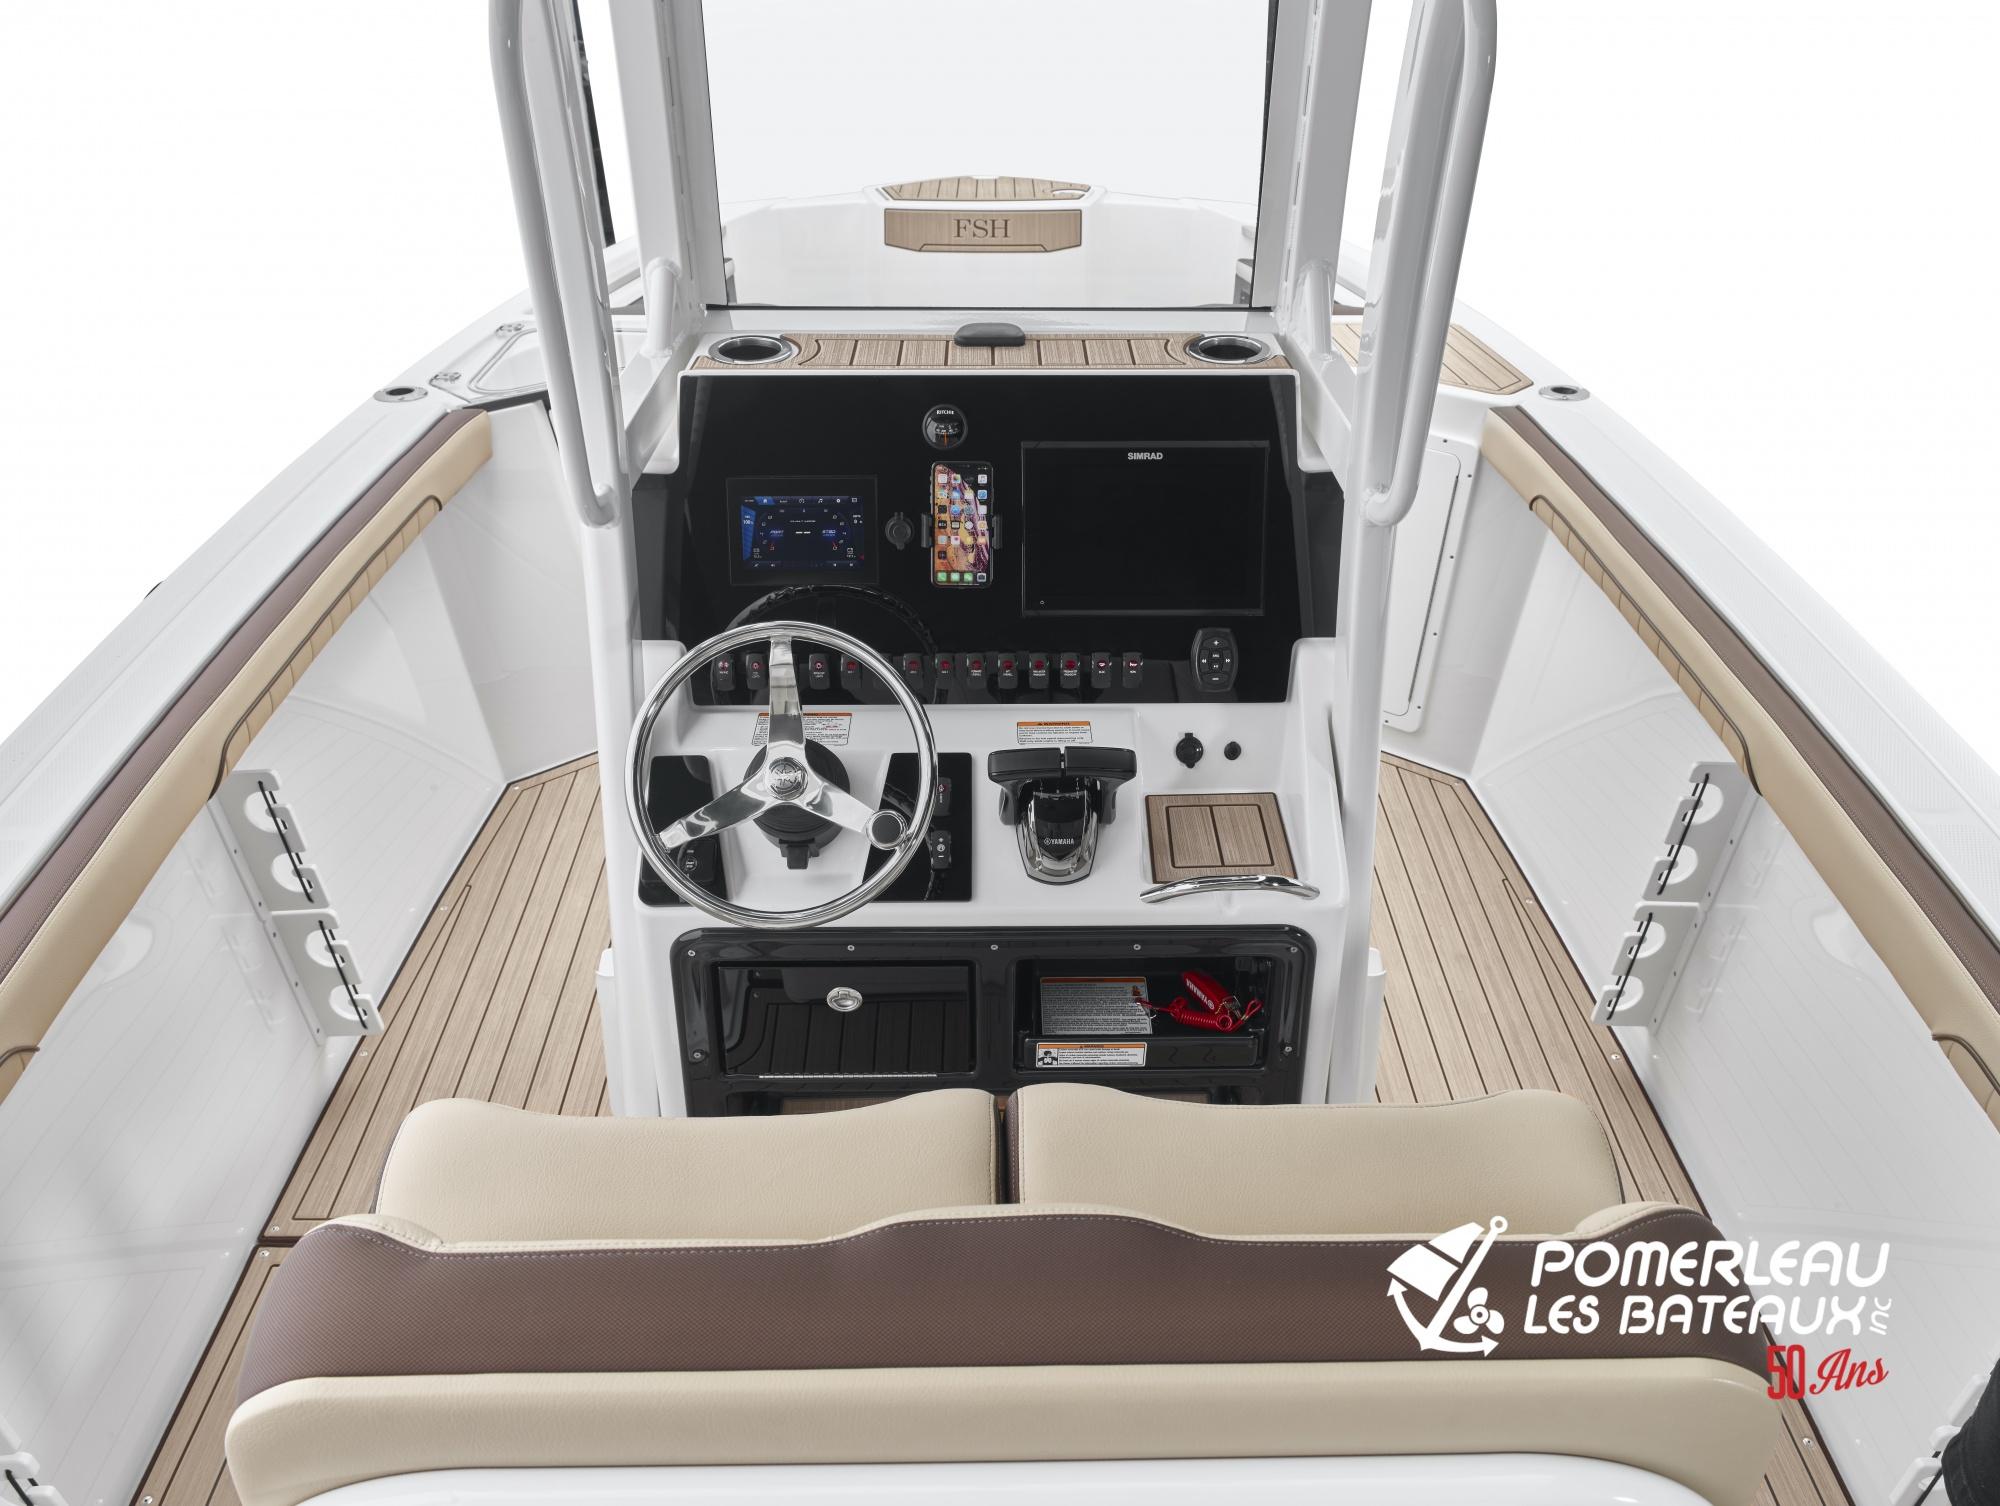 Yamaha 255 FSH SportE - 2021_255FSHSportE_Detail_Helm-screen1